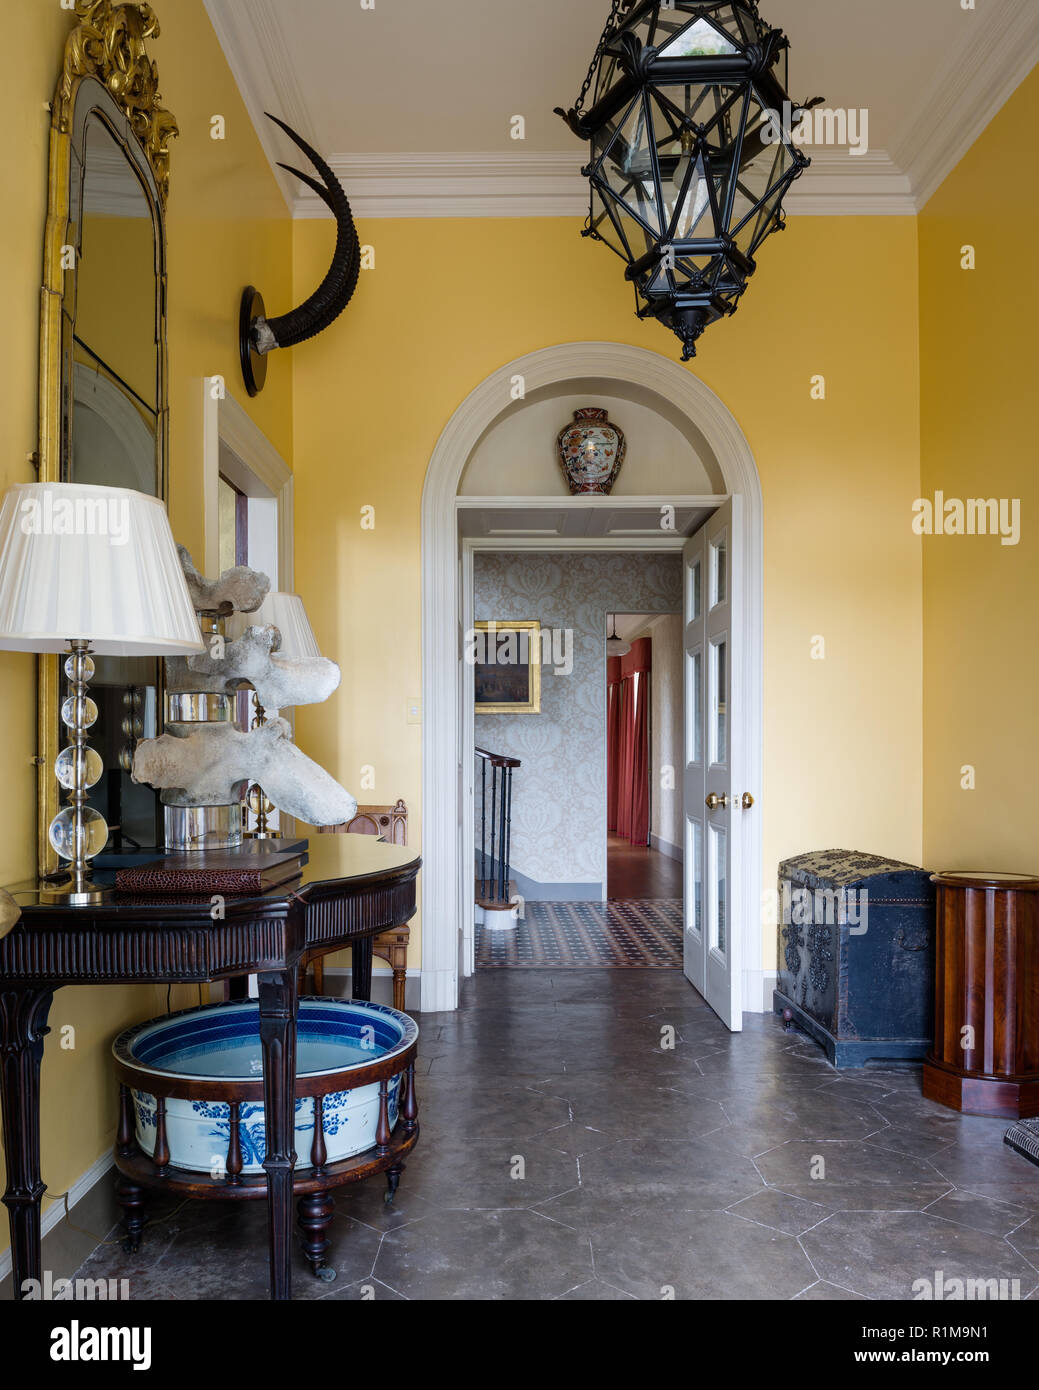 Yellow entrance hall - Stock Image